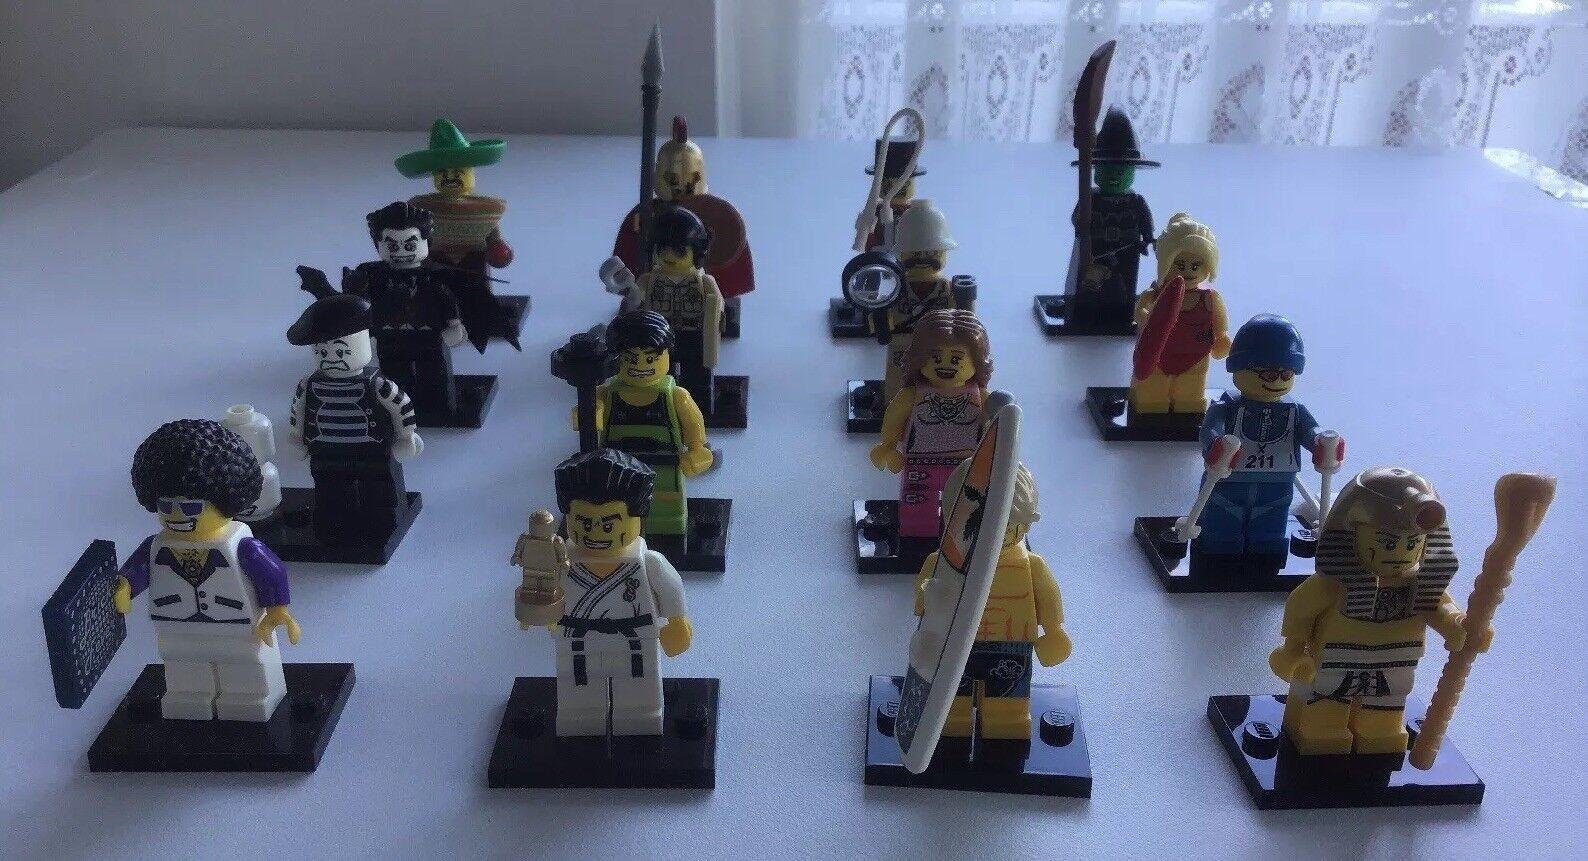 Lego minifigures serie 2 Set 8684 completa 16 Minifiguras desde 2010